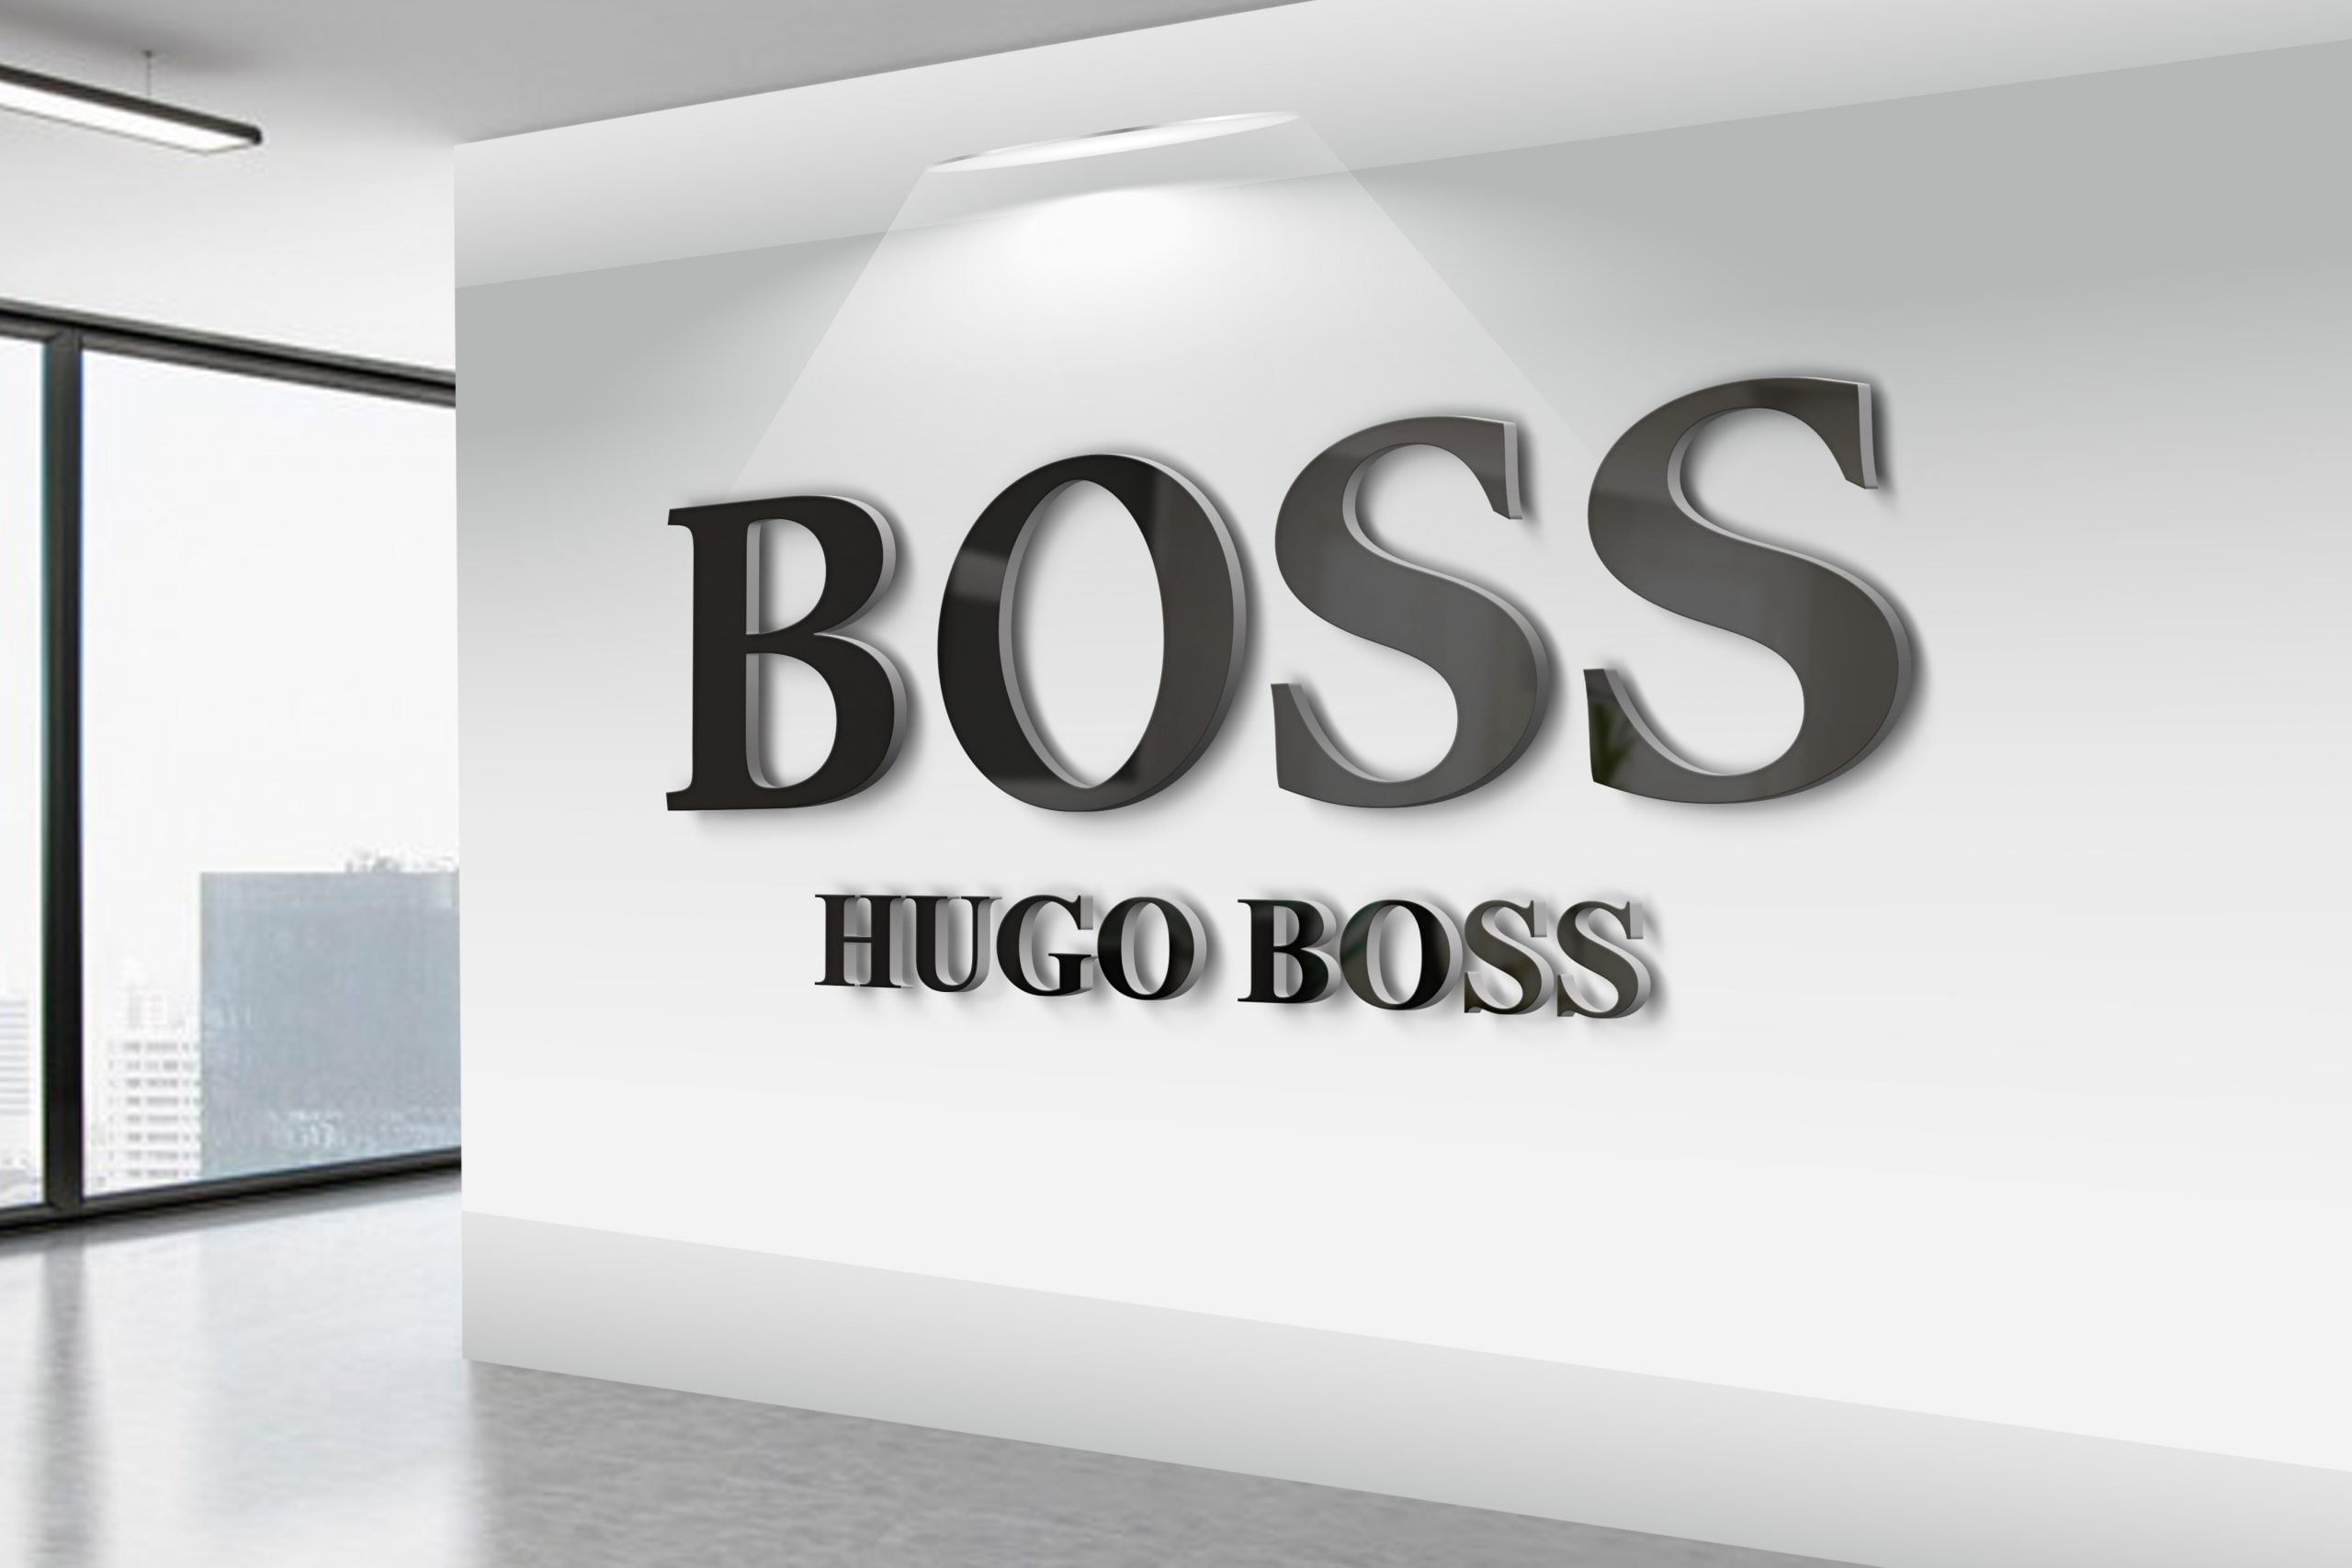 Hugo-Boss-3D-Wall-Logo-MockUp